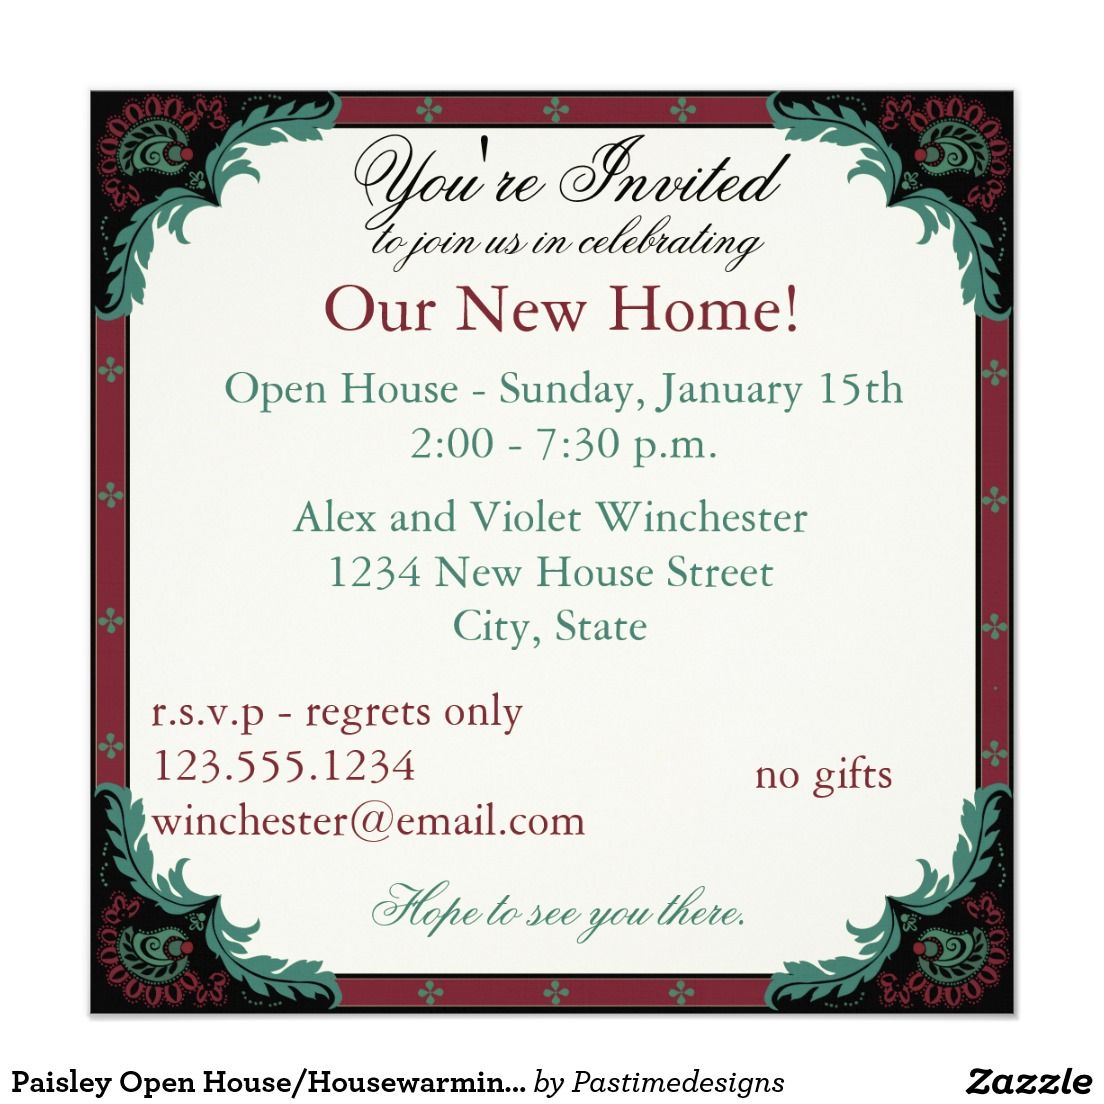 paisley open house housewarming party 5 25x5 25 square paper